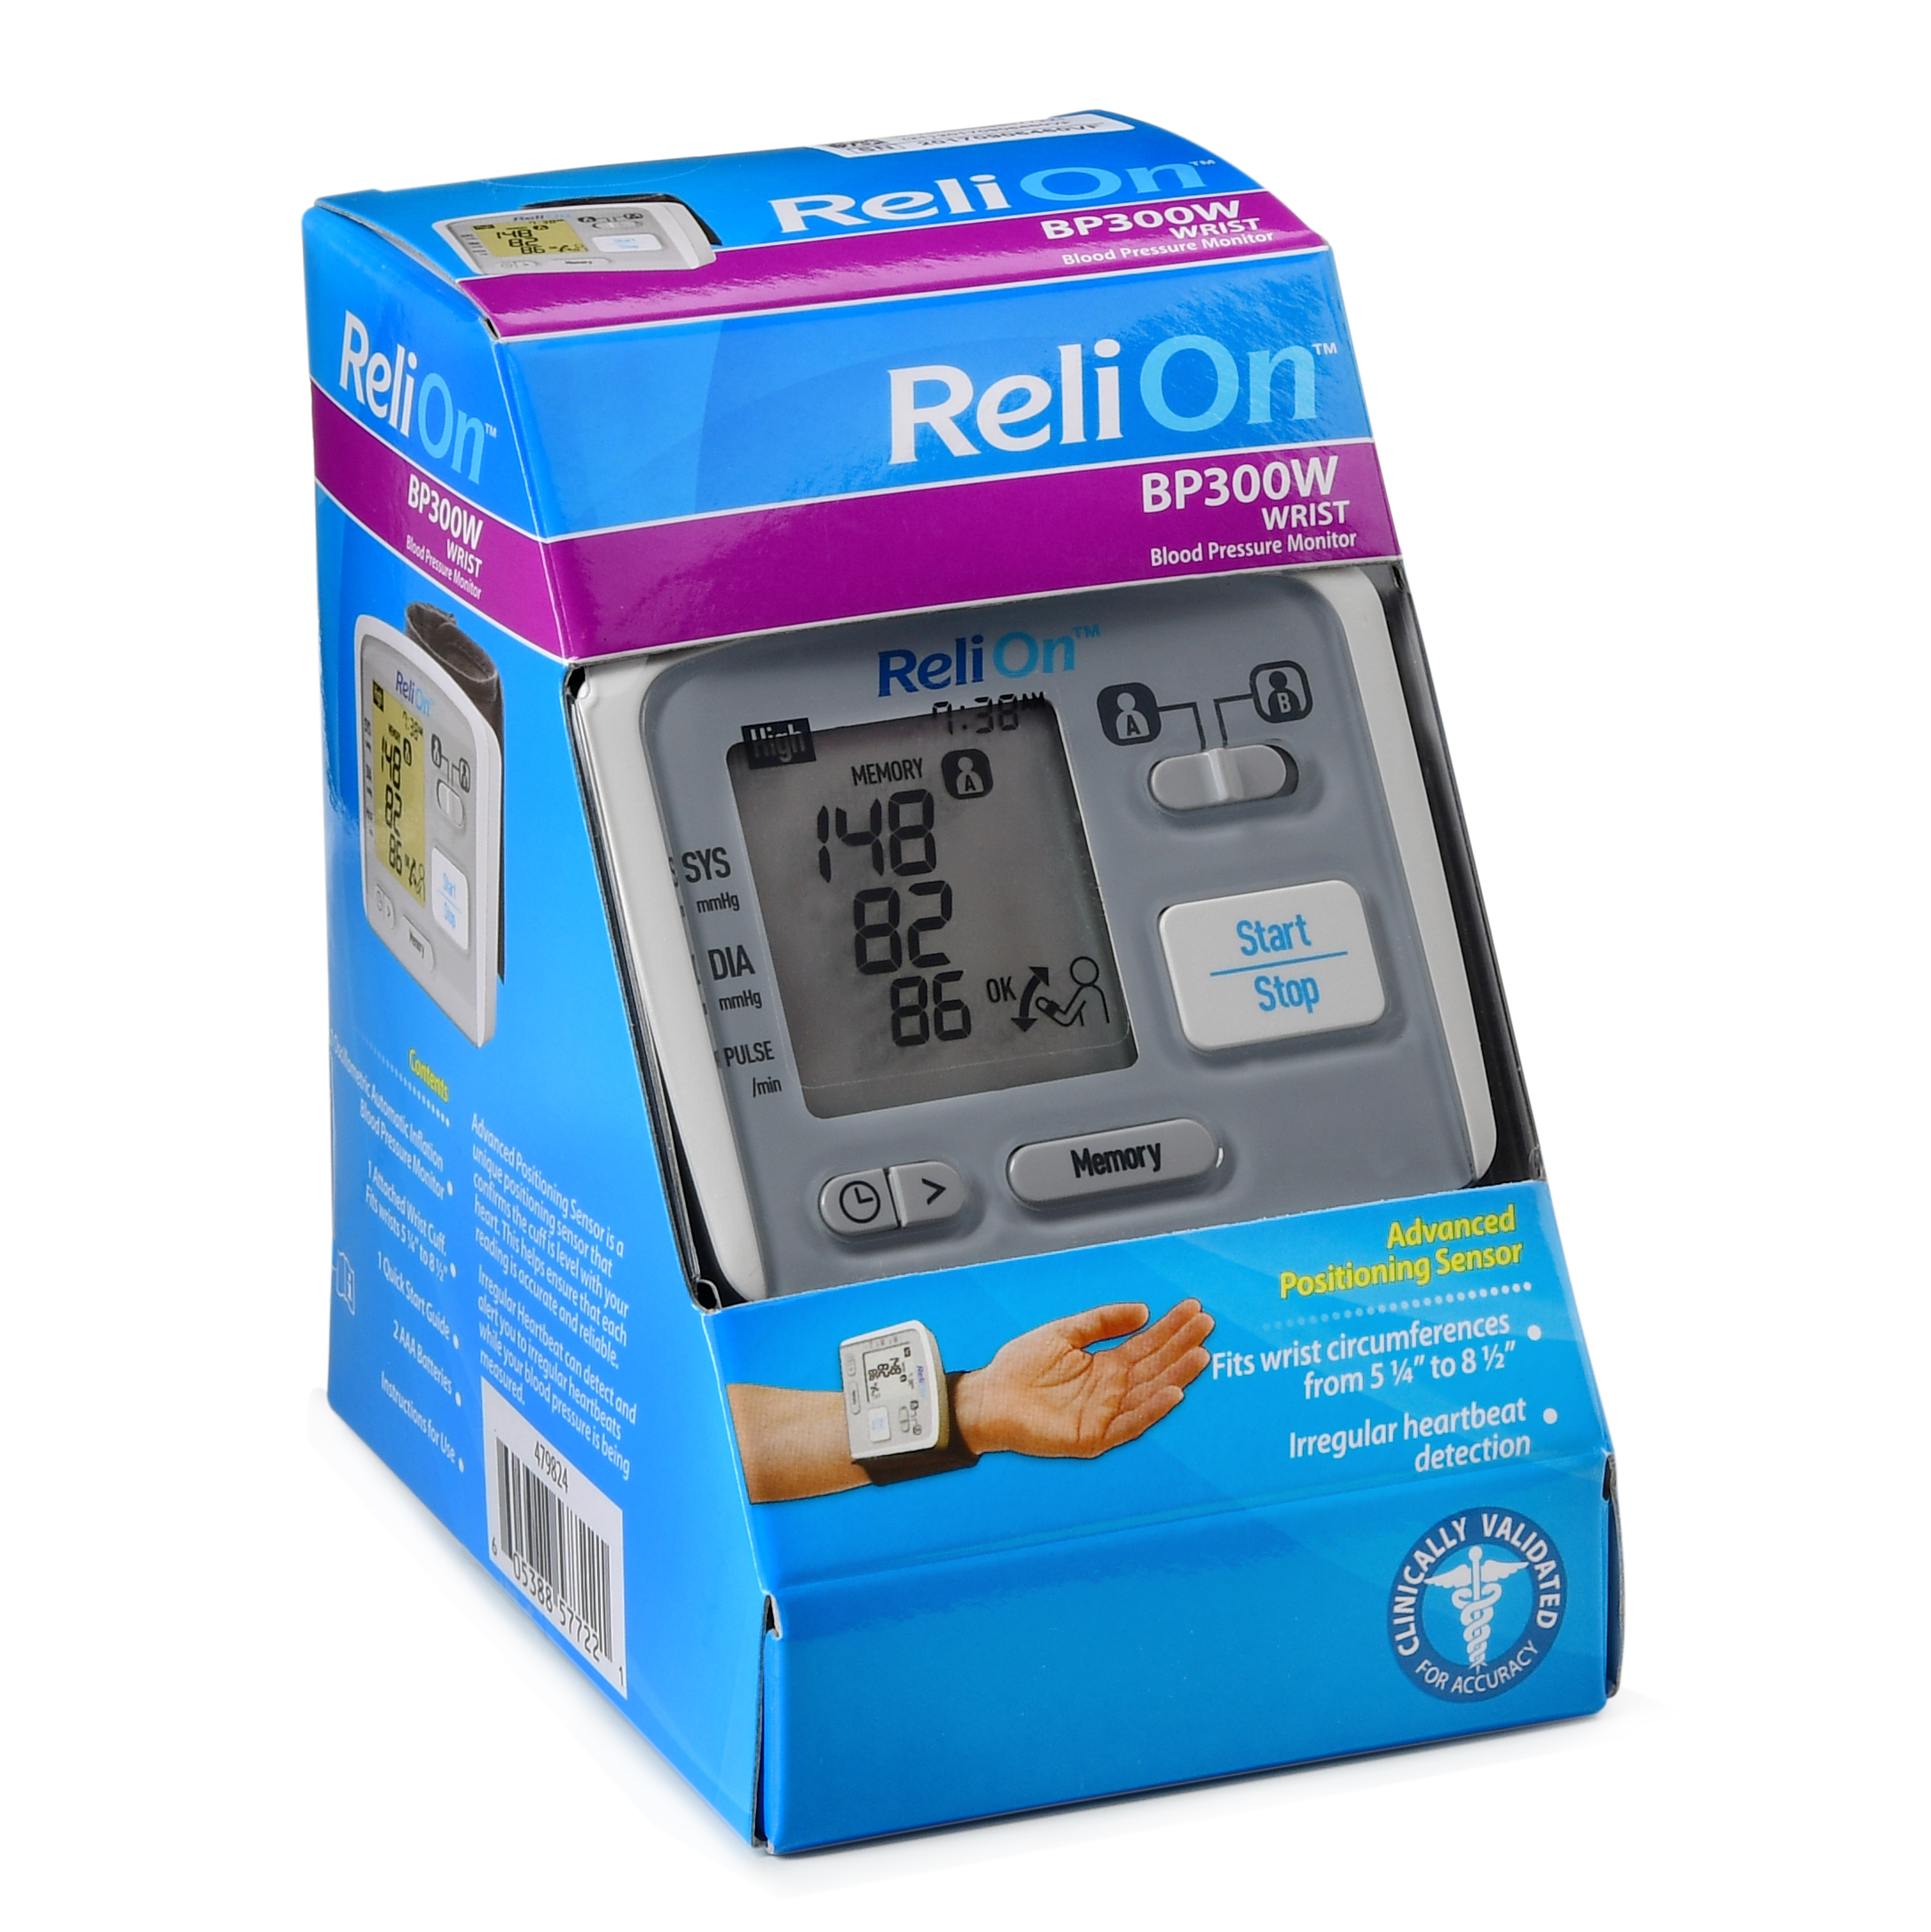 Relion Bp300w Wrist Blood Pressure Monitor Tensimeter Digital Wristband